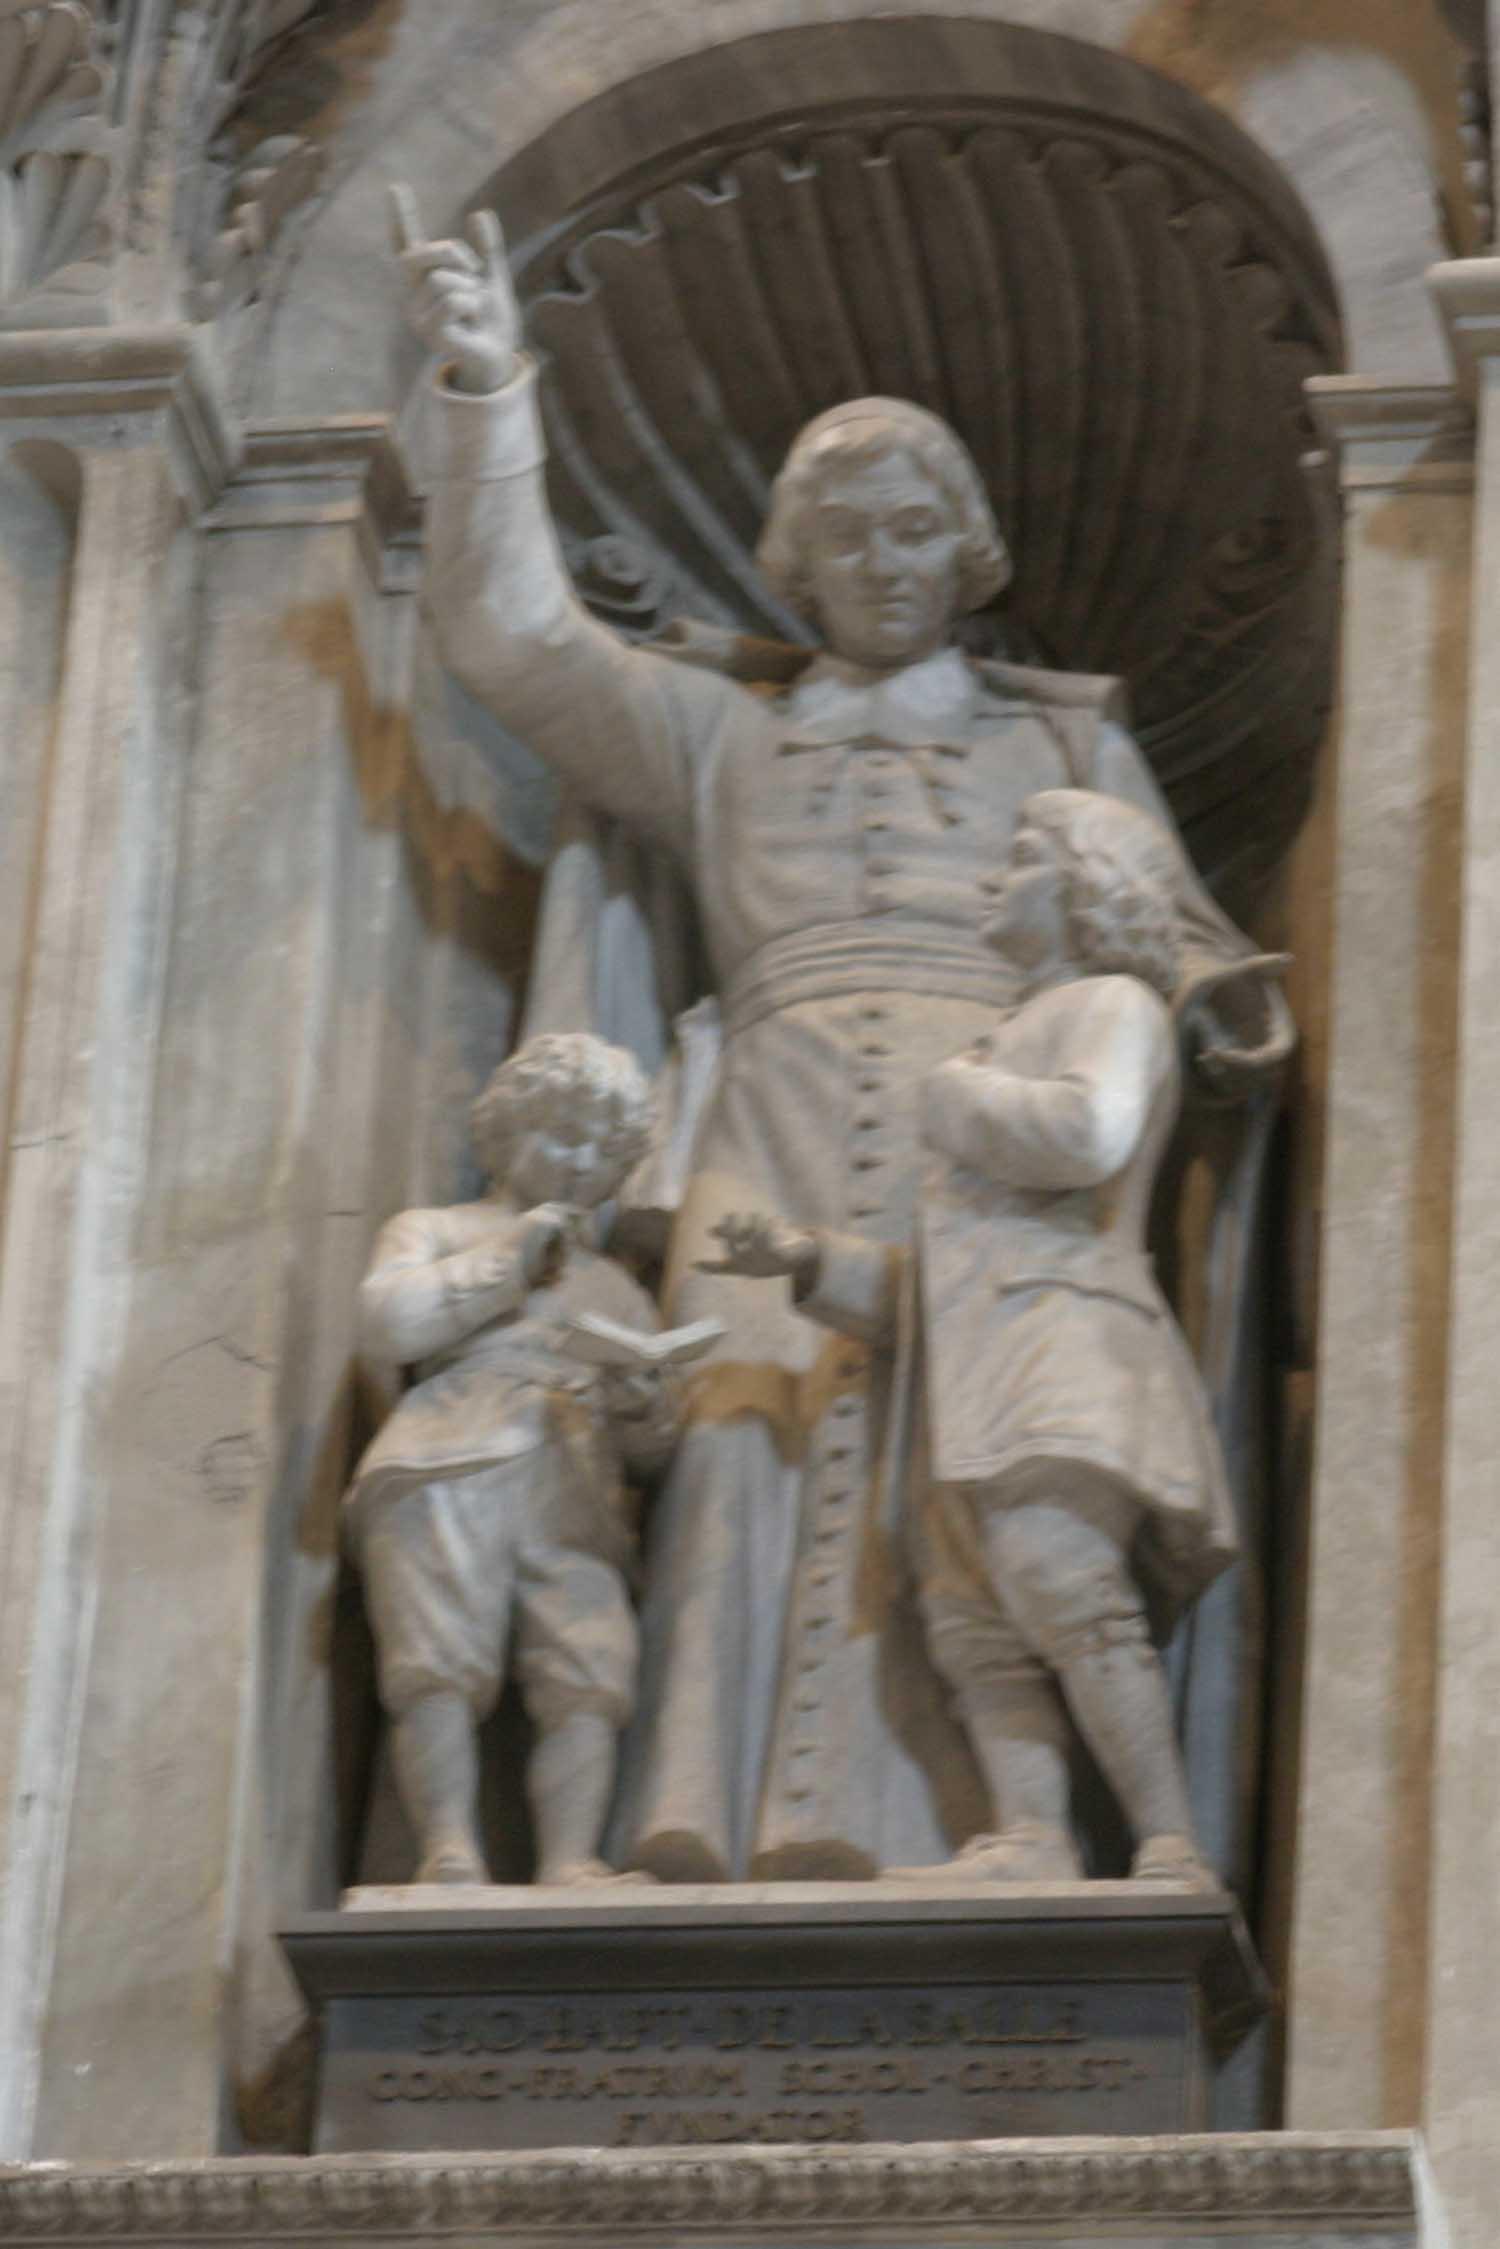 St. John Baptist de la Salle - Founder Statue